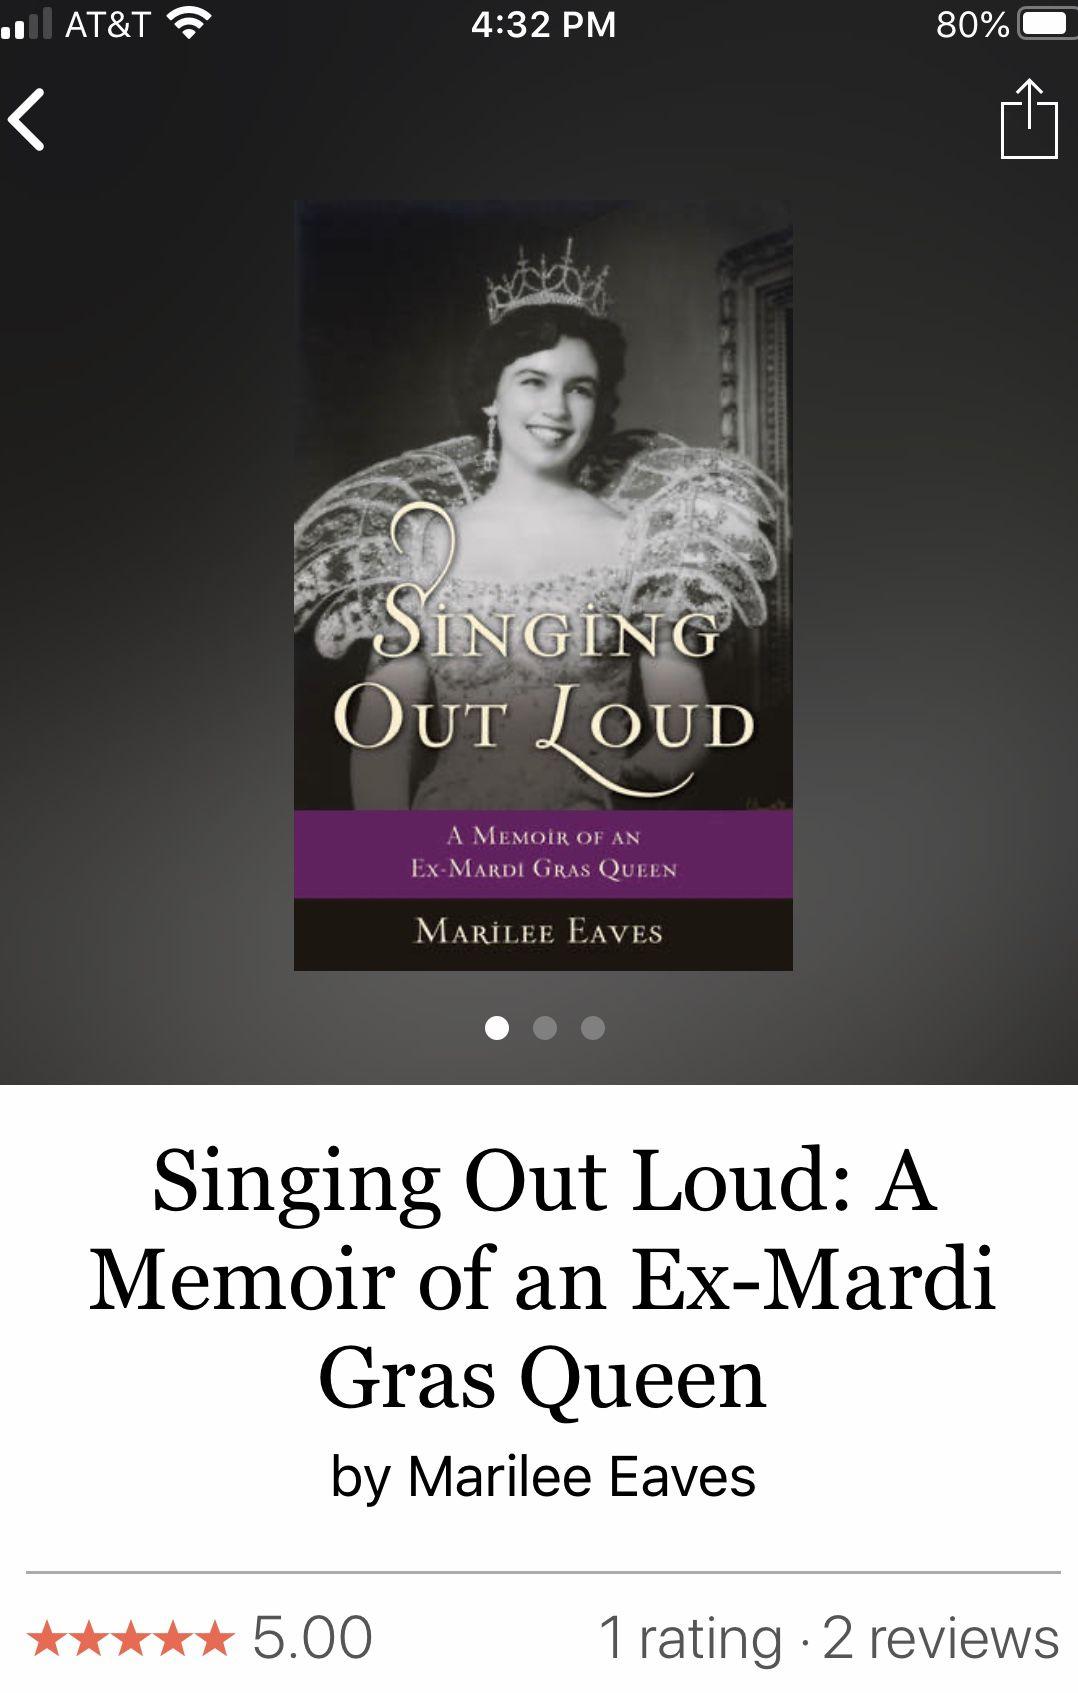 Singing Out Loud by Marilee Eaves